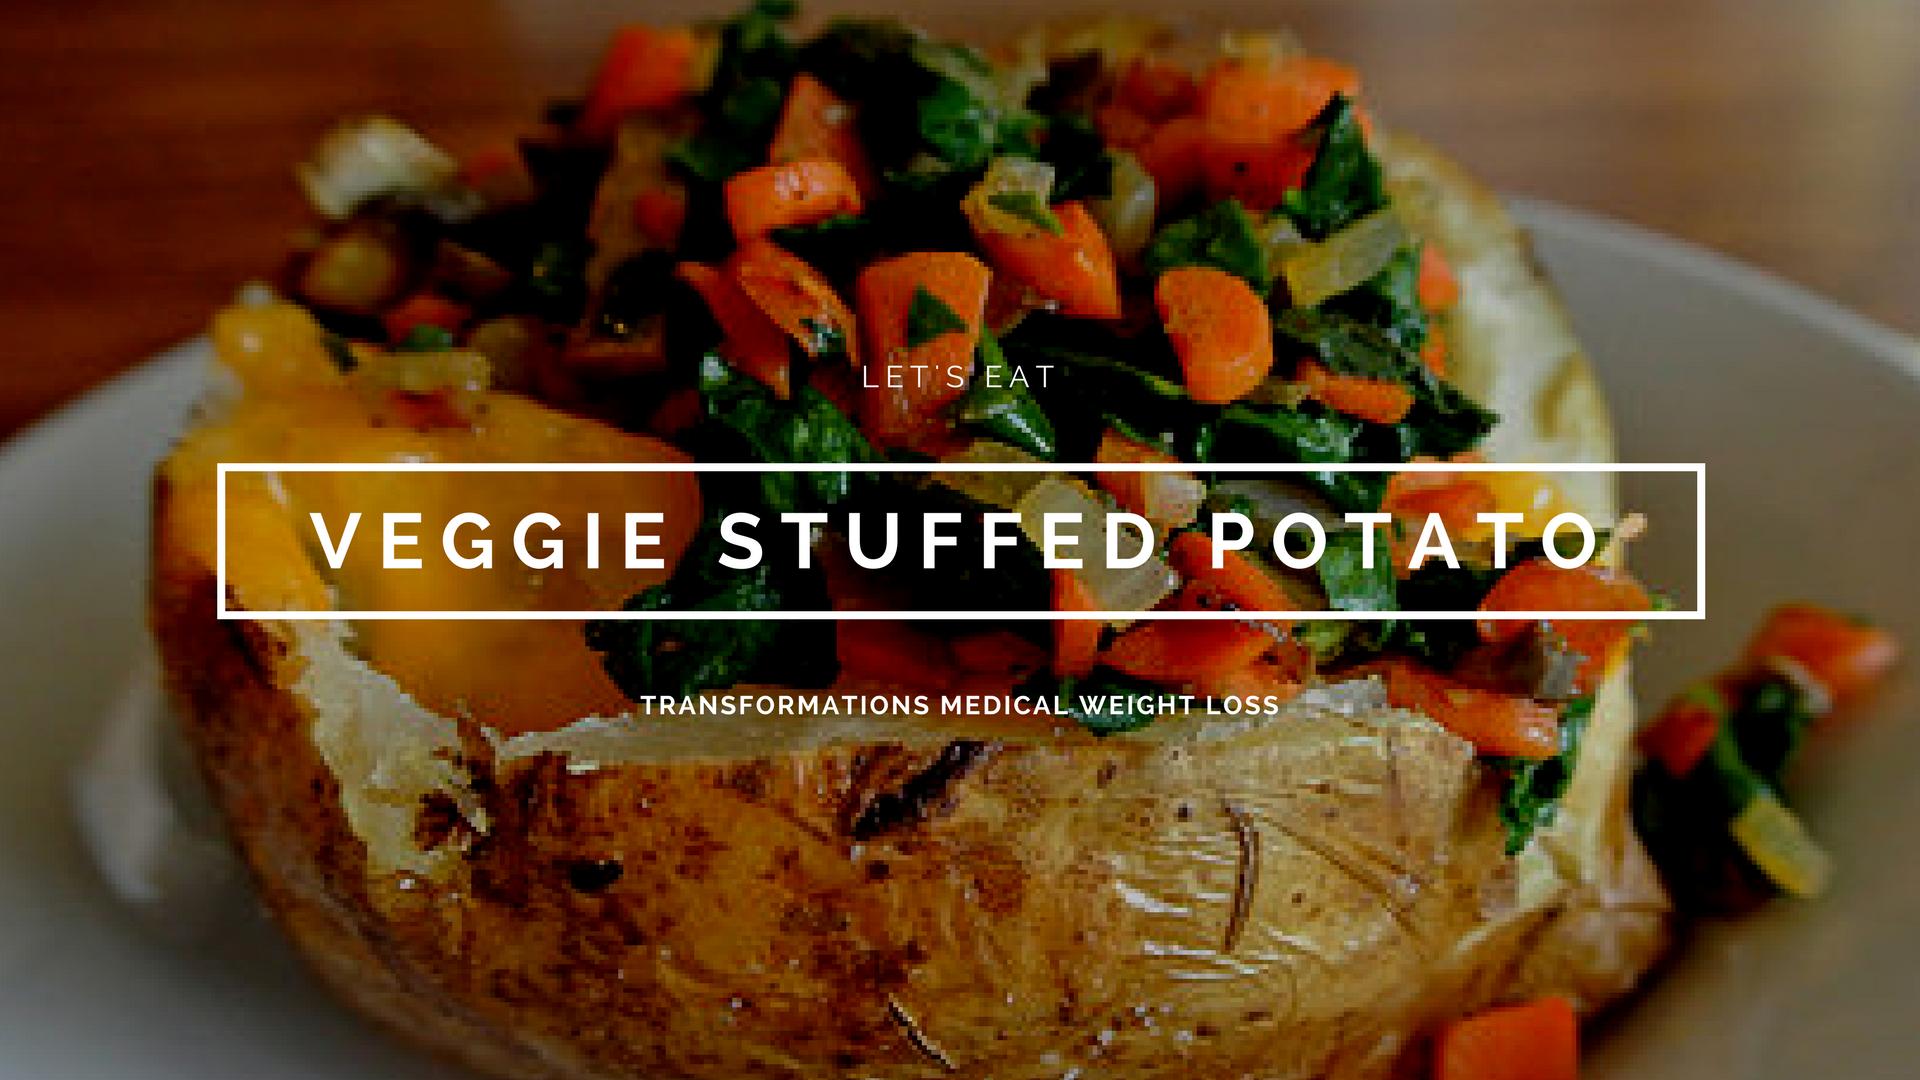 Veggie Stuffed Potato